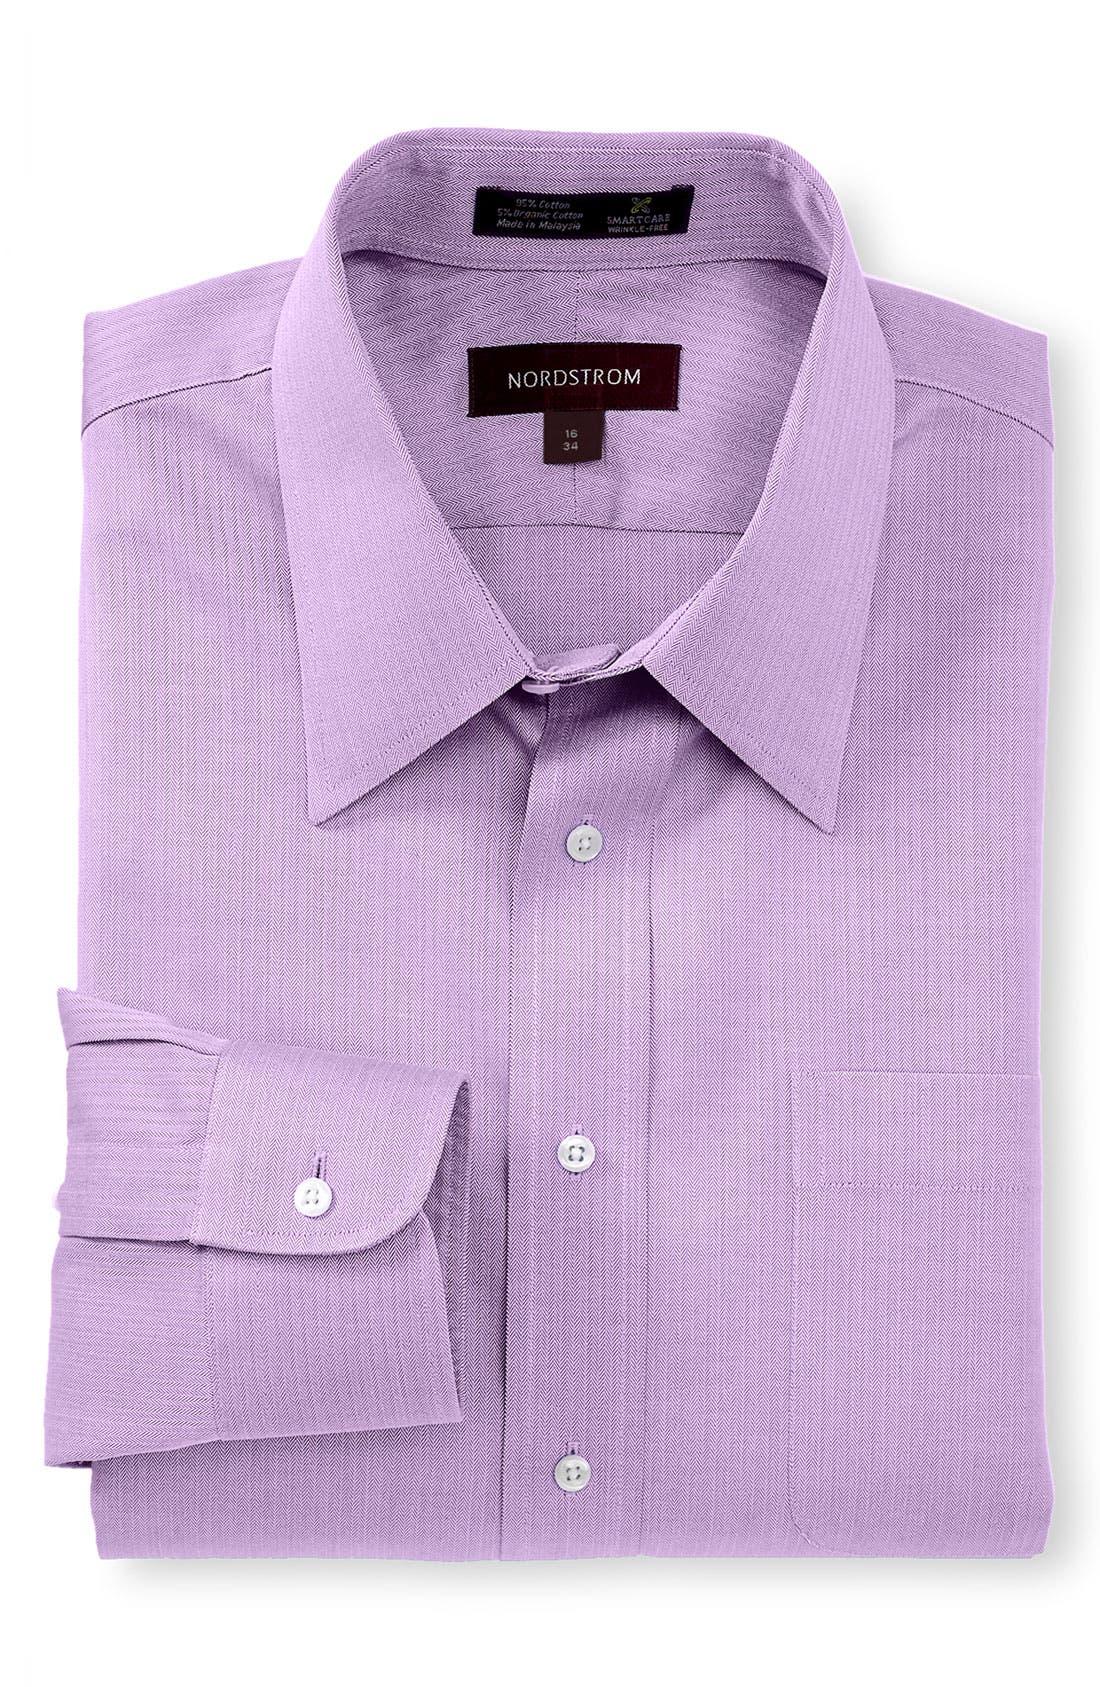 Main Image - Nordstrom Men's Shop Smartcare™ Wrinkle Free Traditional Fit Herringbone Dress Shirt